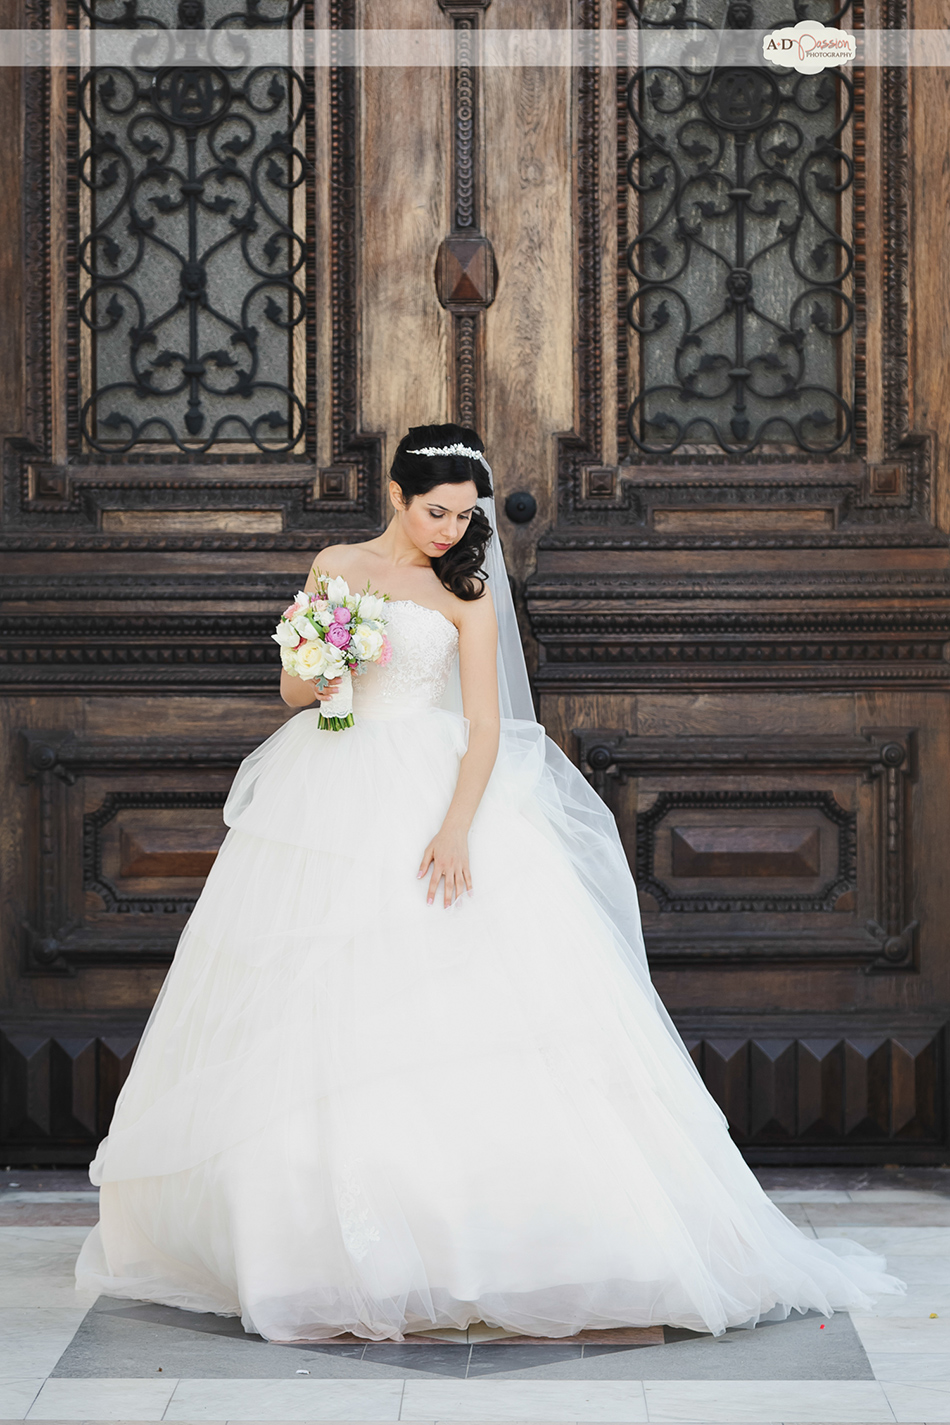 AD Passion Photography | fotograf-profesionist-de-nunta-arad-timisoara-bucuresti_madalina+mihnea_0096 | Adelin, Dida, fotograf profesionist, fotograf de nunta, fotografie de nunta, fotograf Timisoara, fotograf Craiova, fotograf Bucuresti, fotograf Arad, nunta Timisoara, nunta Arad, nunta Bucuresti, nunta Craiova